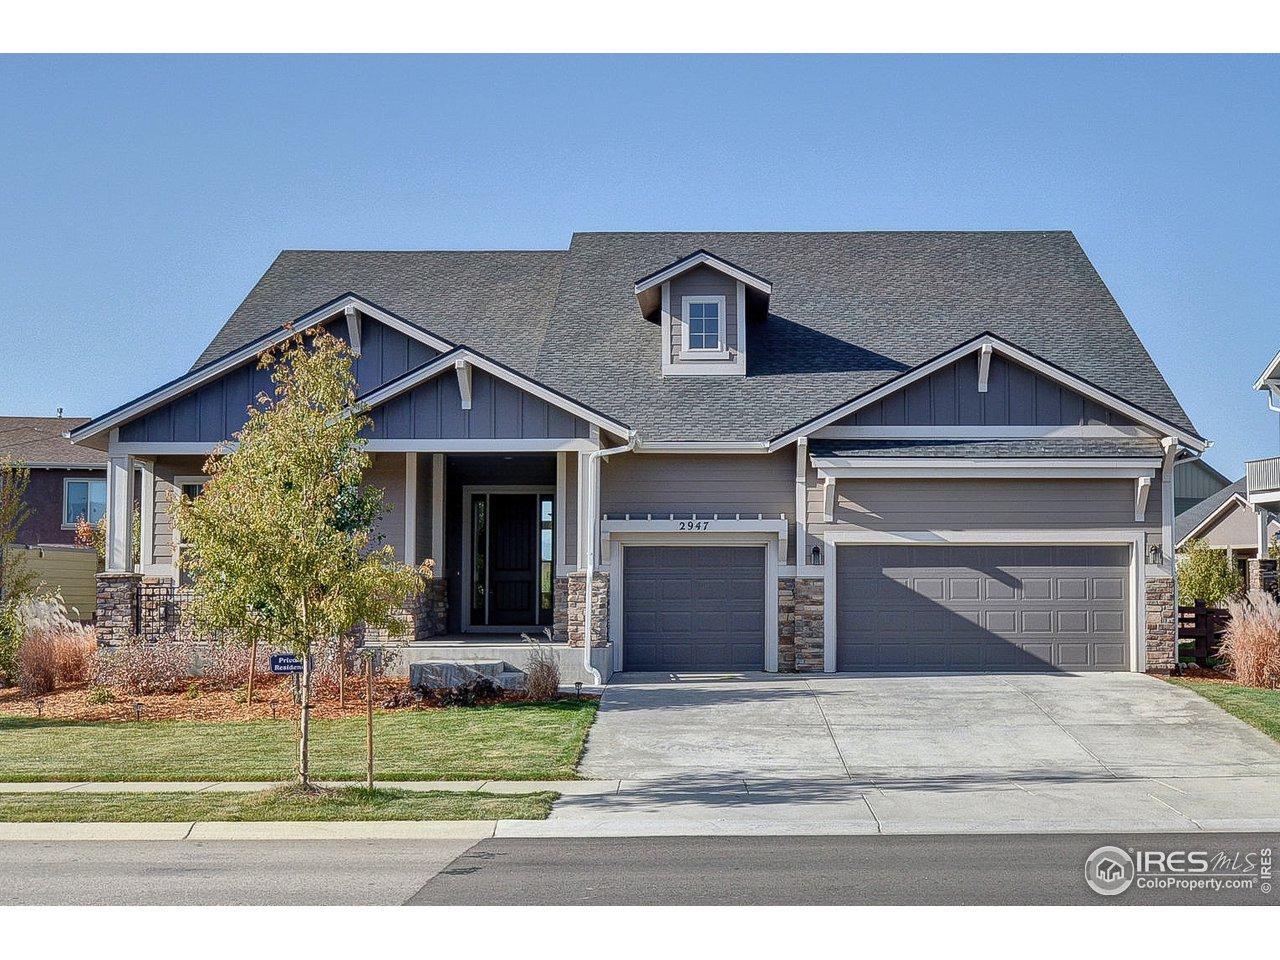 2947 Zephyr Rd, Fort Collins CO 80528